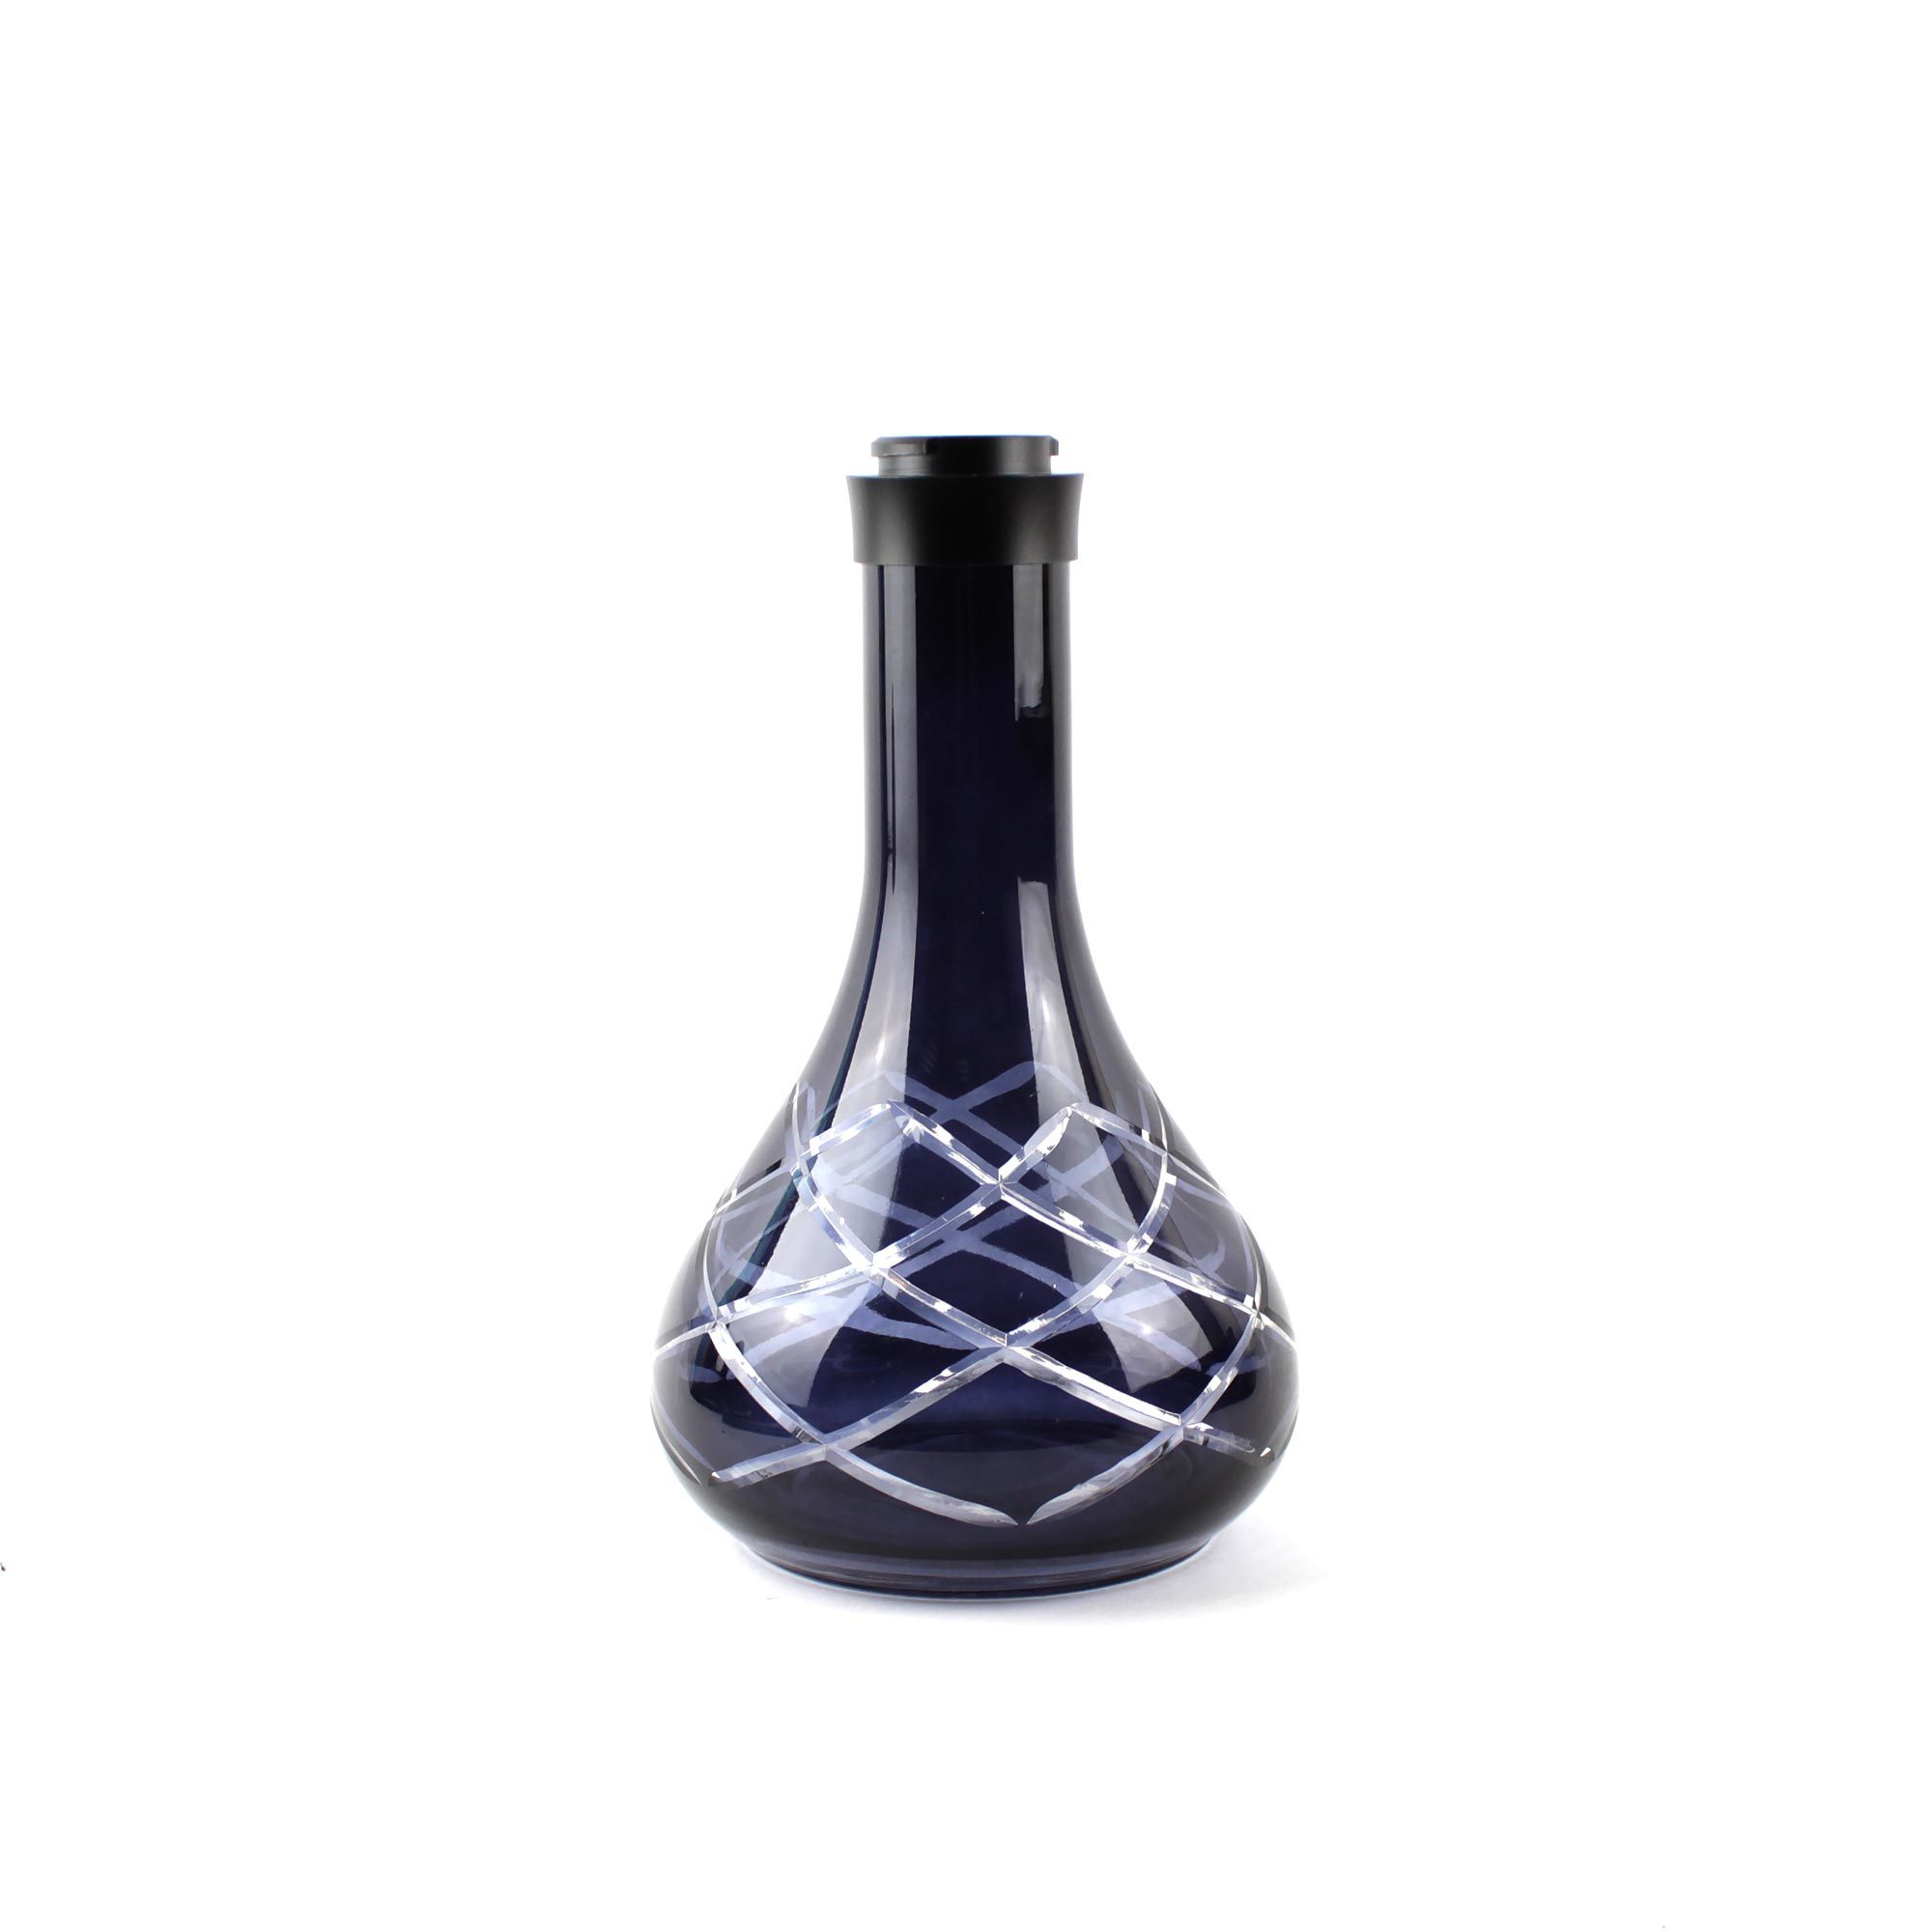 Комплектная темно-синяя колба для Neo Lux 1 Black